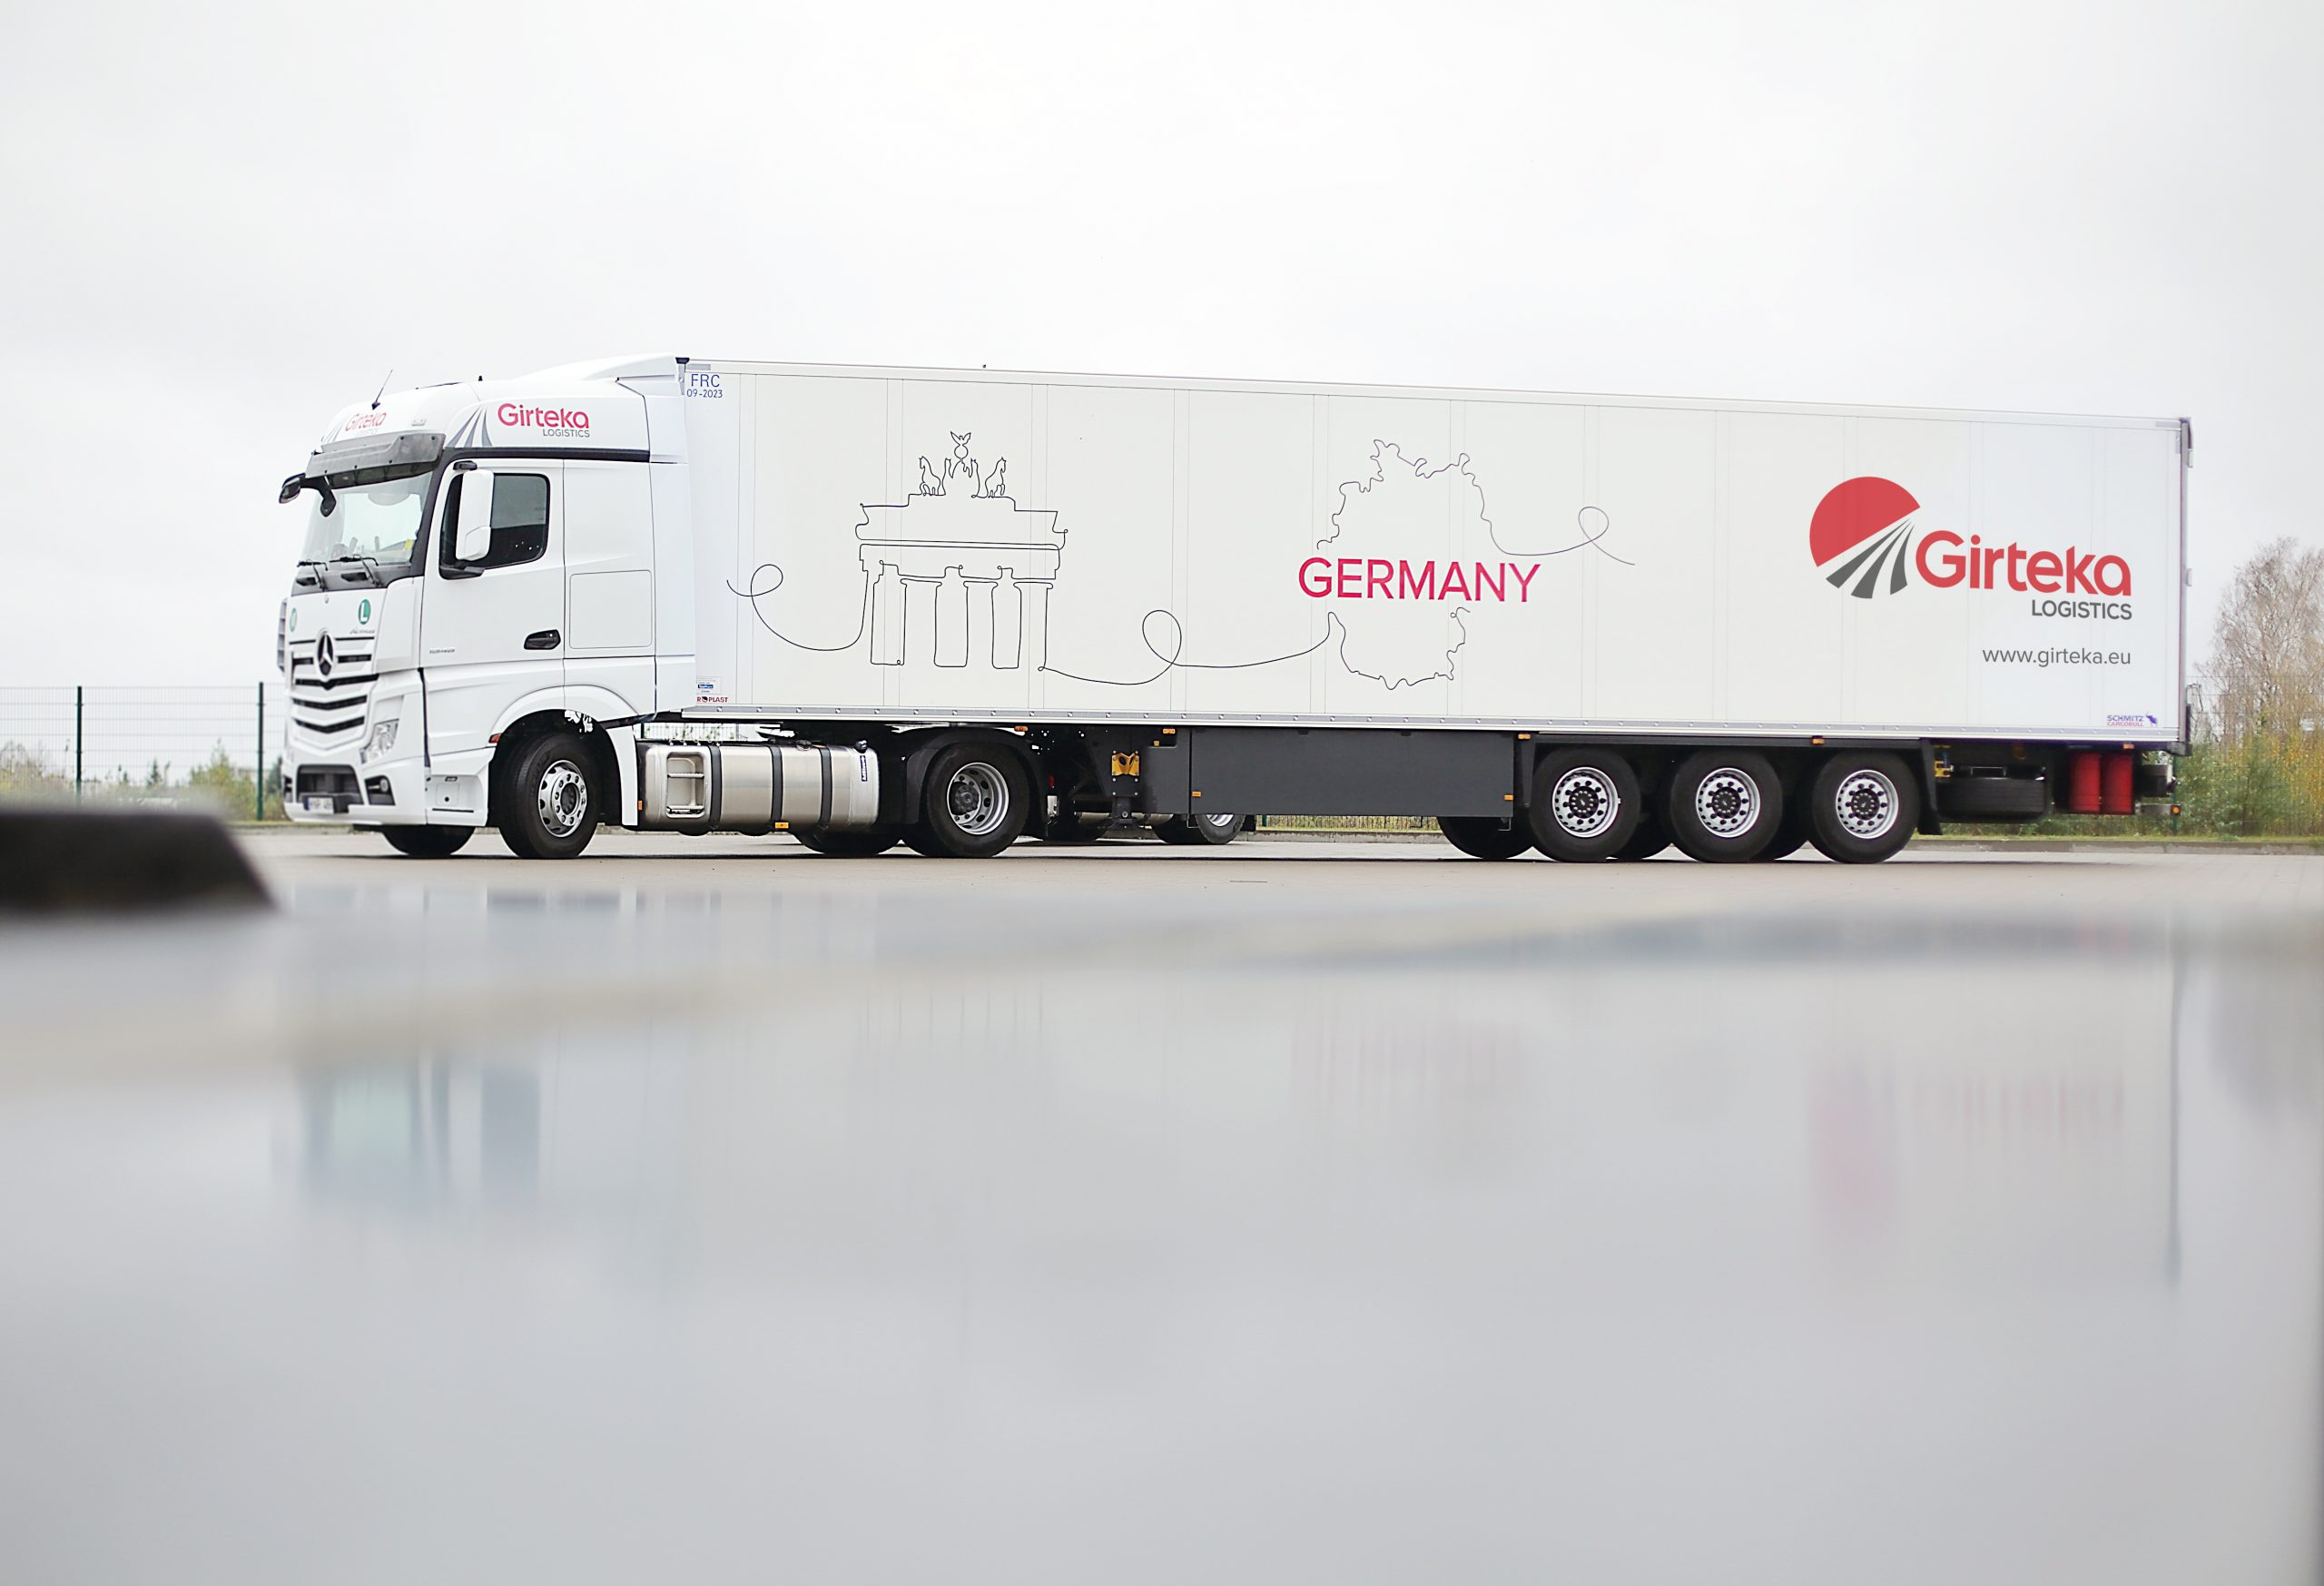 Girteka Logistics обвиняют в незаконном каботаже на территории Норвегии 1